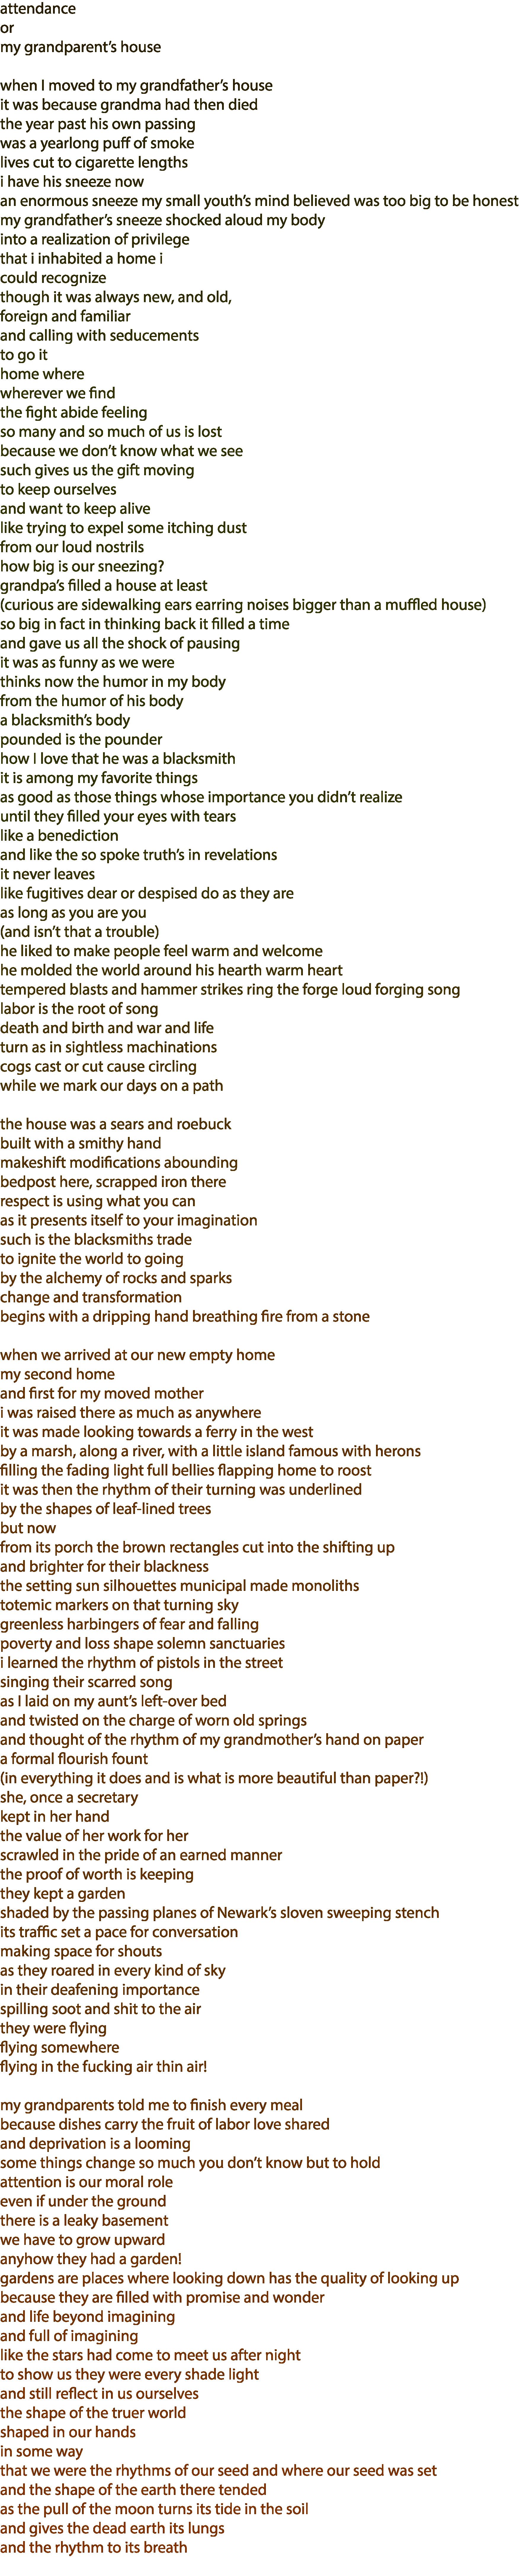 dumbbird xxi poem.png